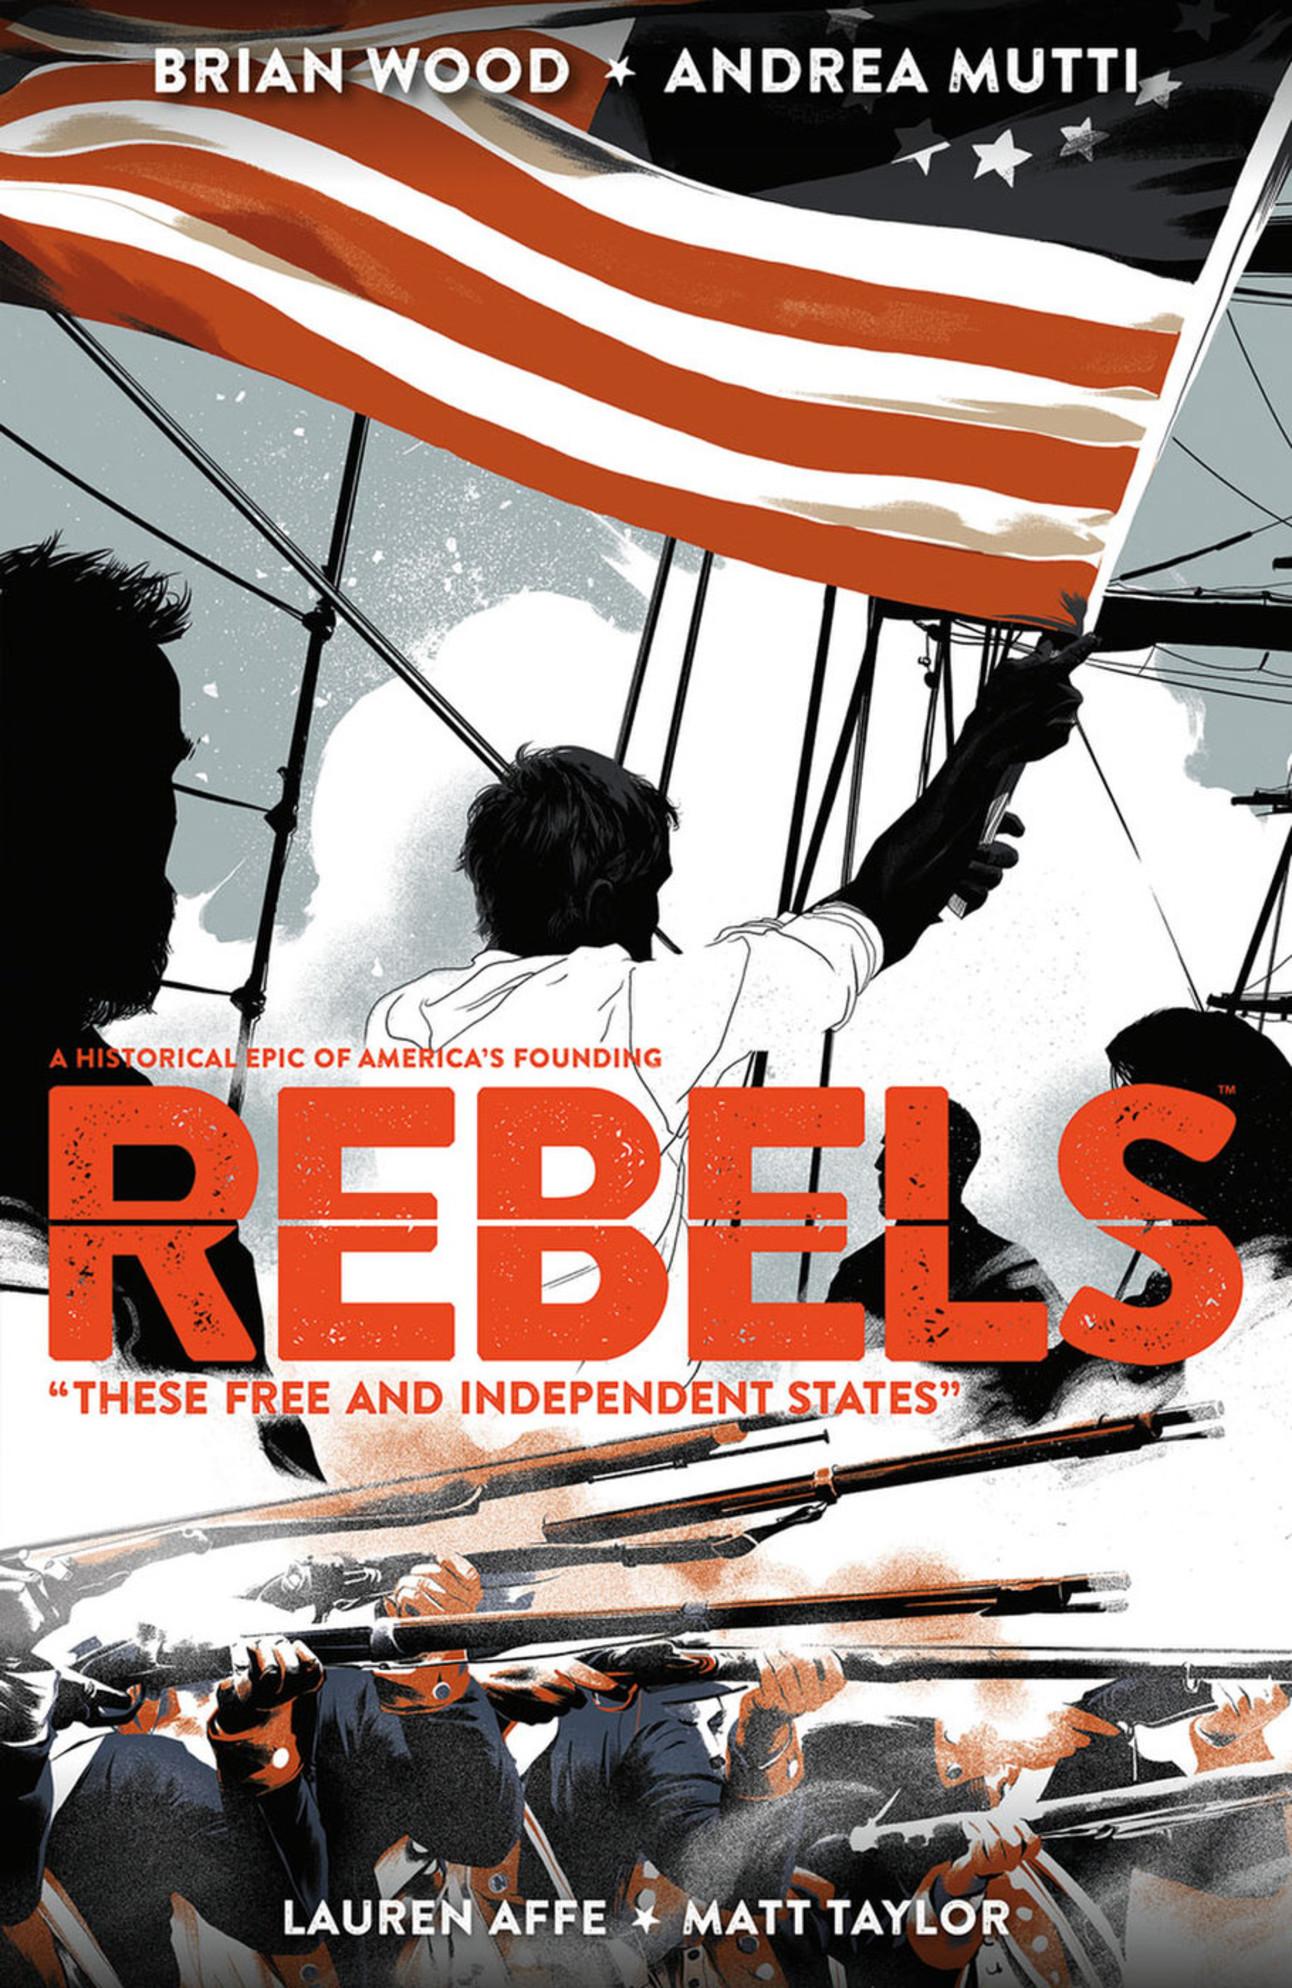 rebels_thesefreeindystates_tp.jpeg